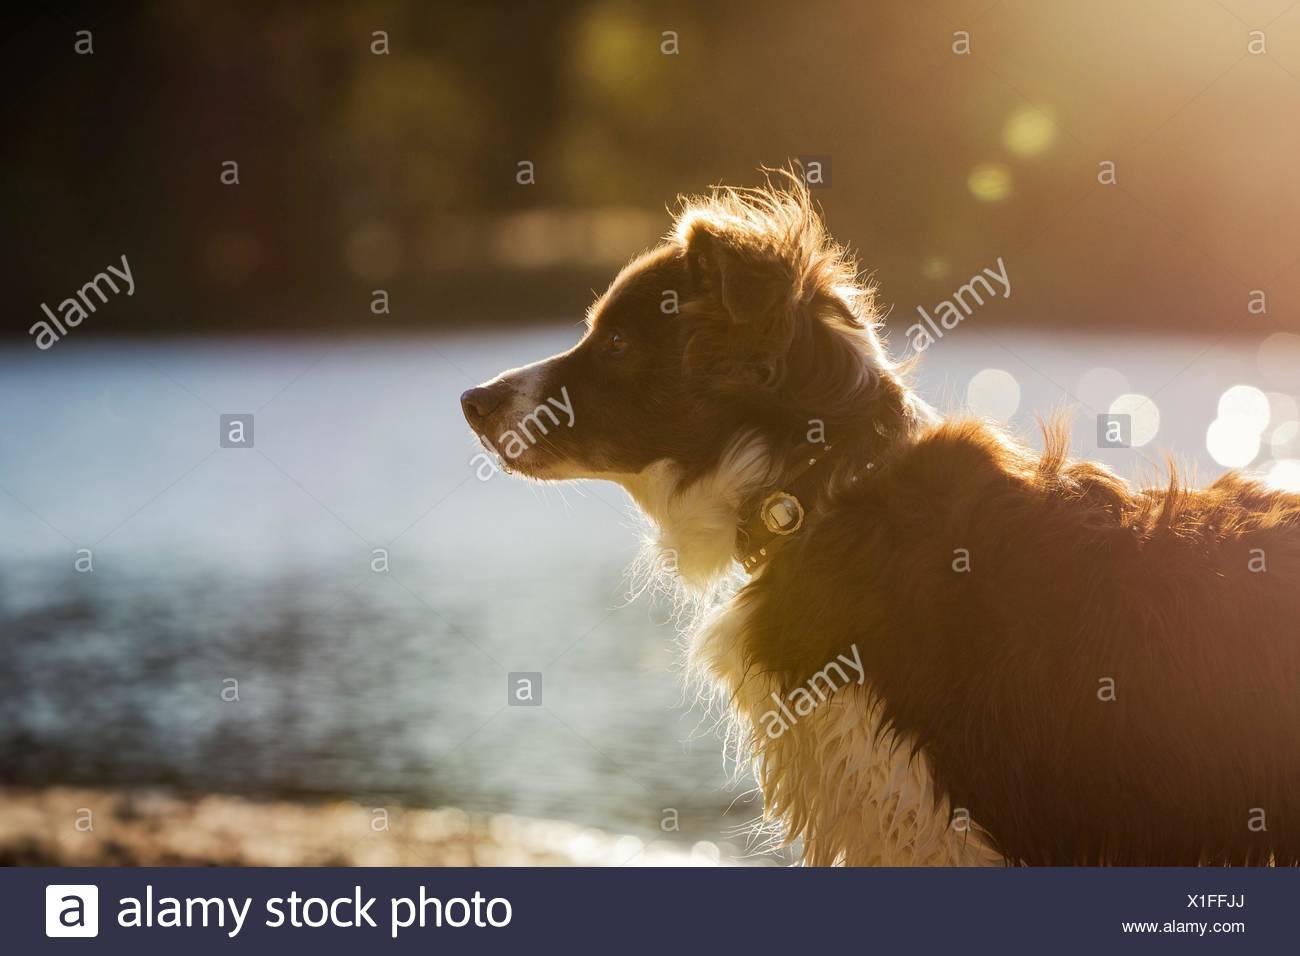 Border Collie at lakesite - Stock Image